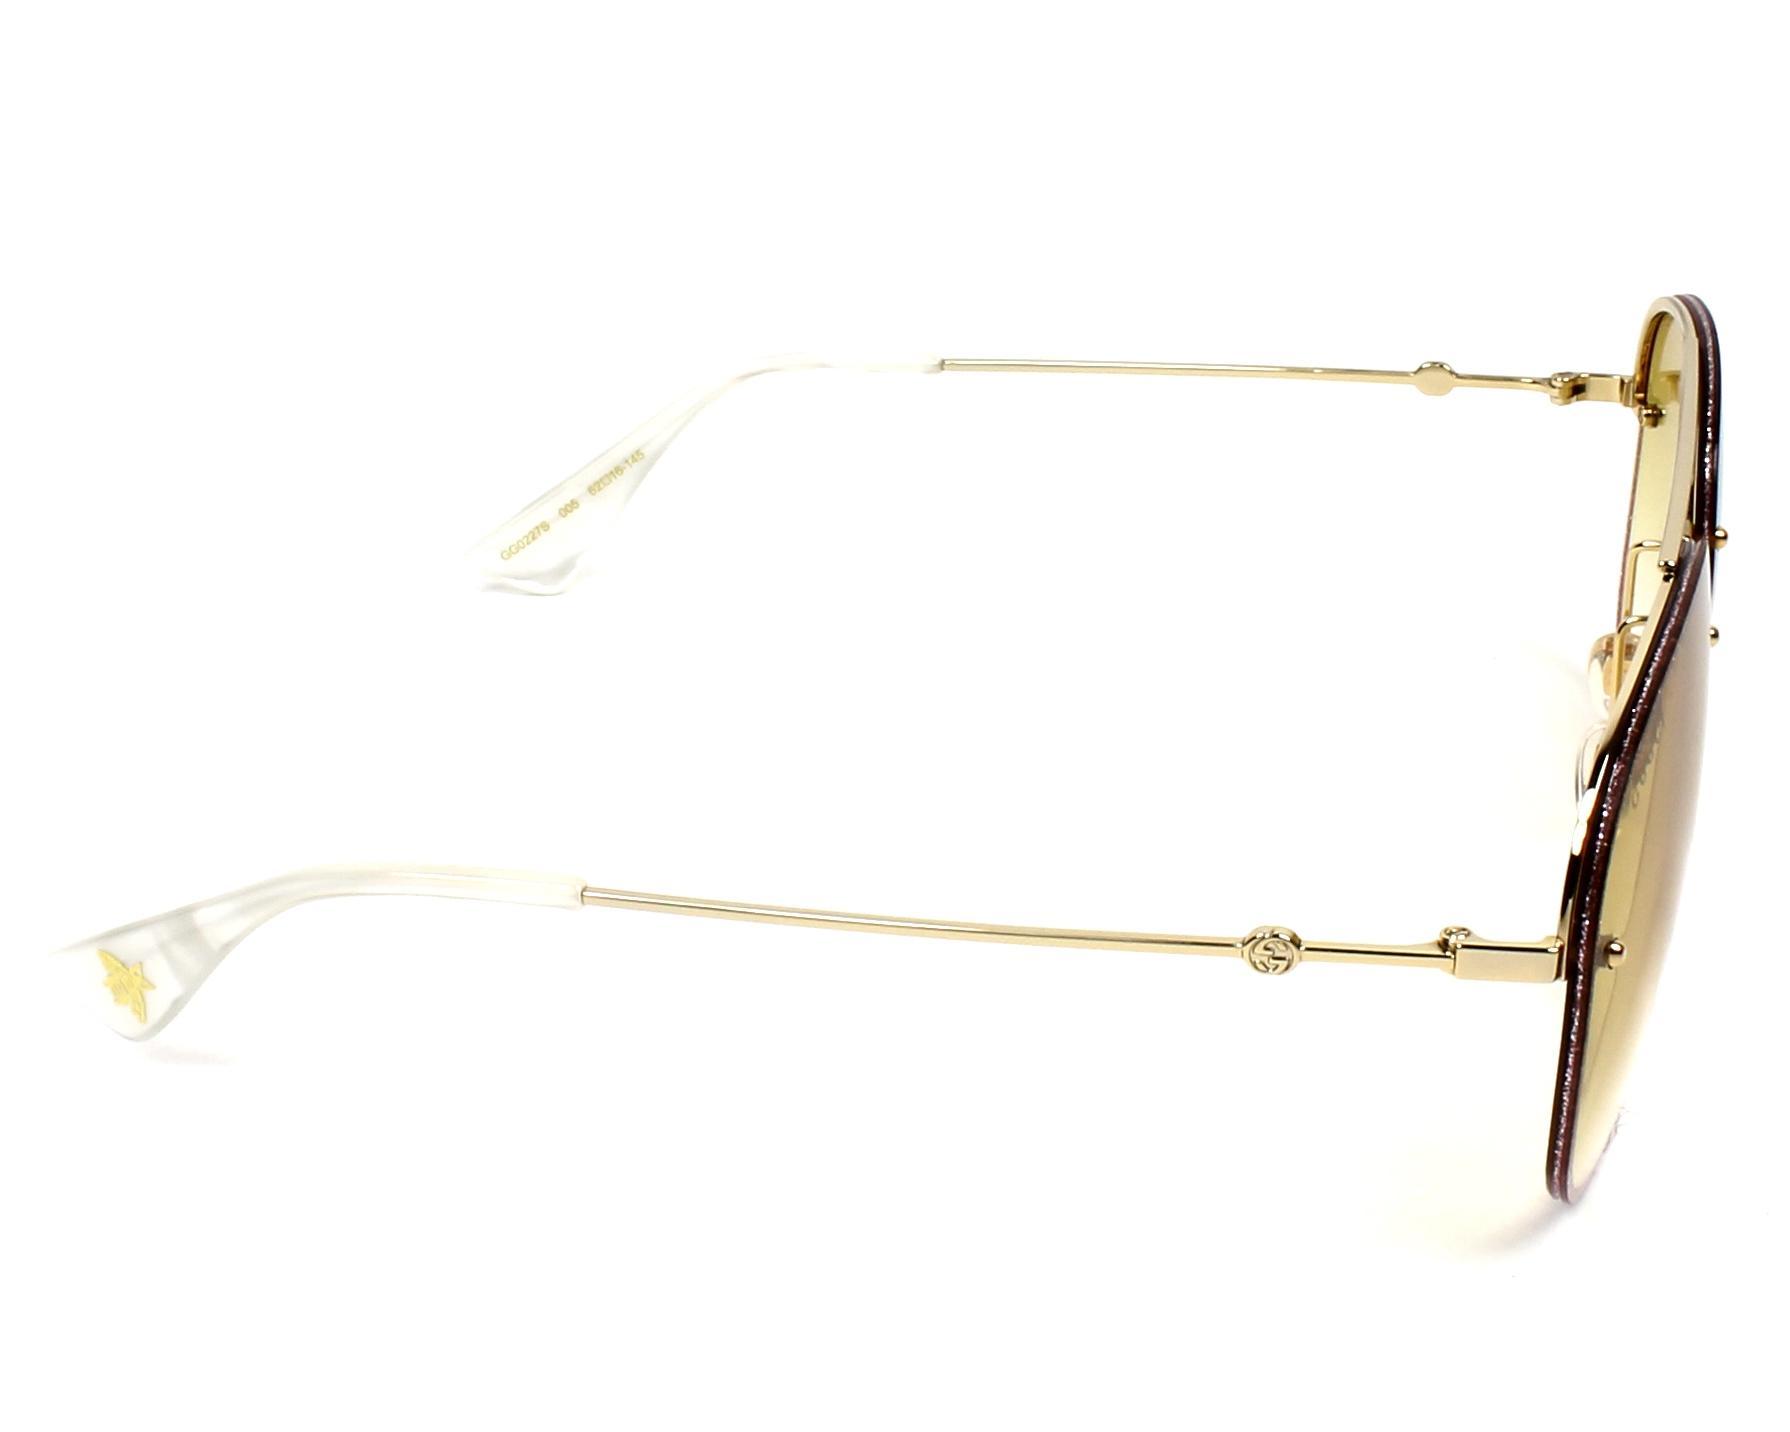 99aeeb4acd7 Sunglasses Gucci GG-0227-S 005 62-16 Rosa Gold side view